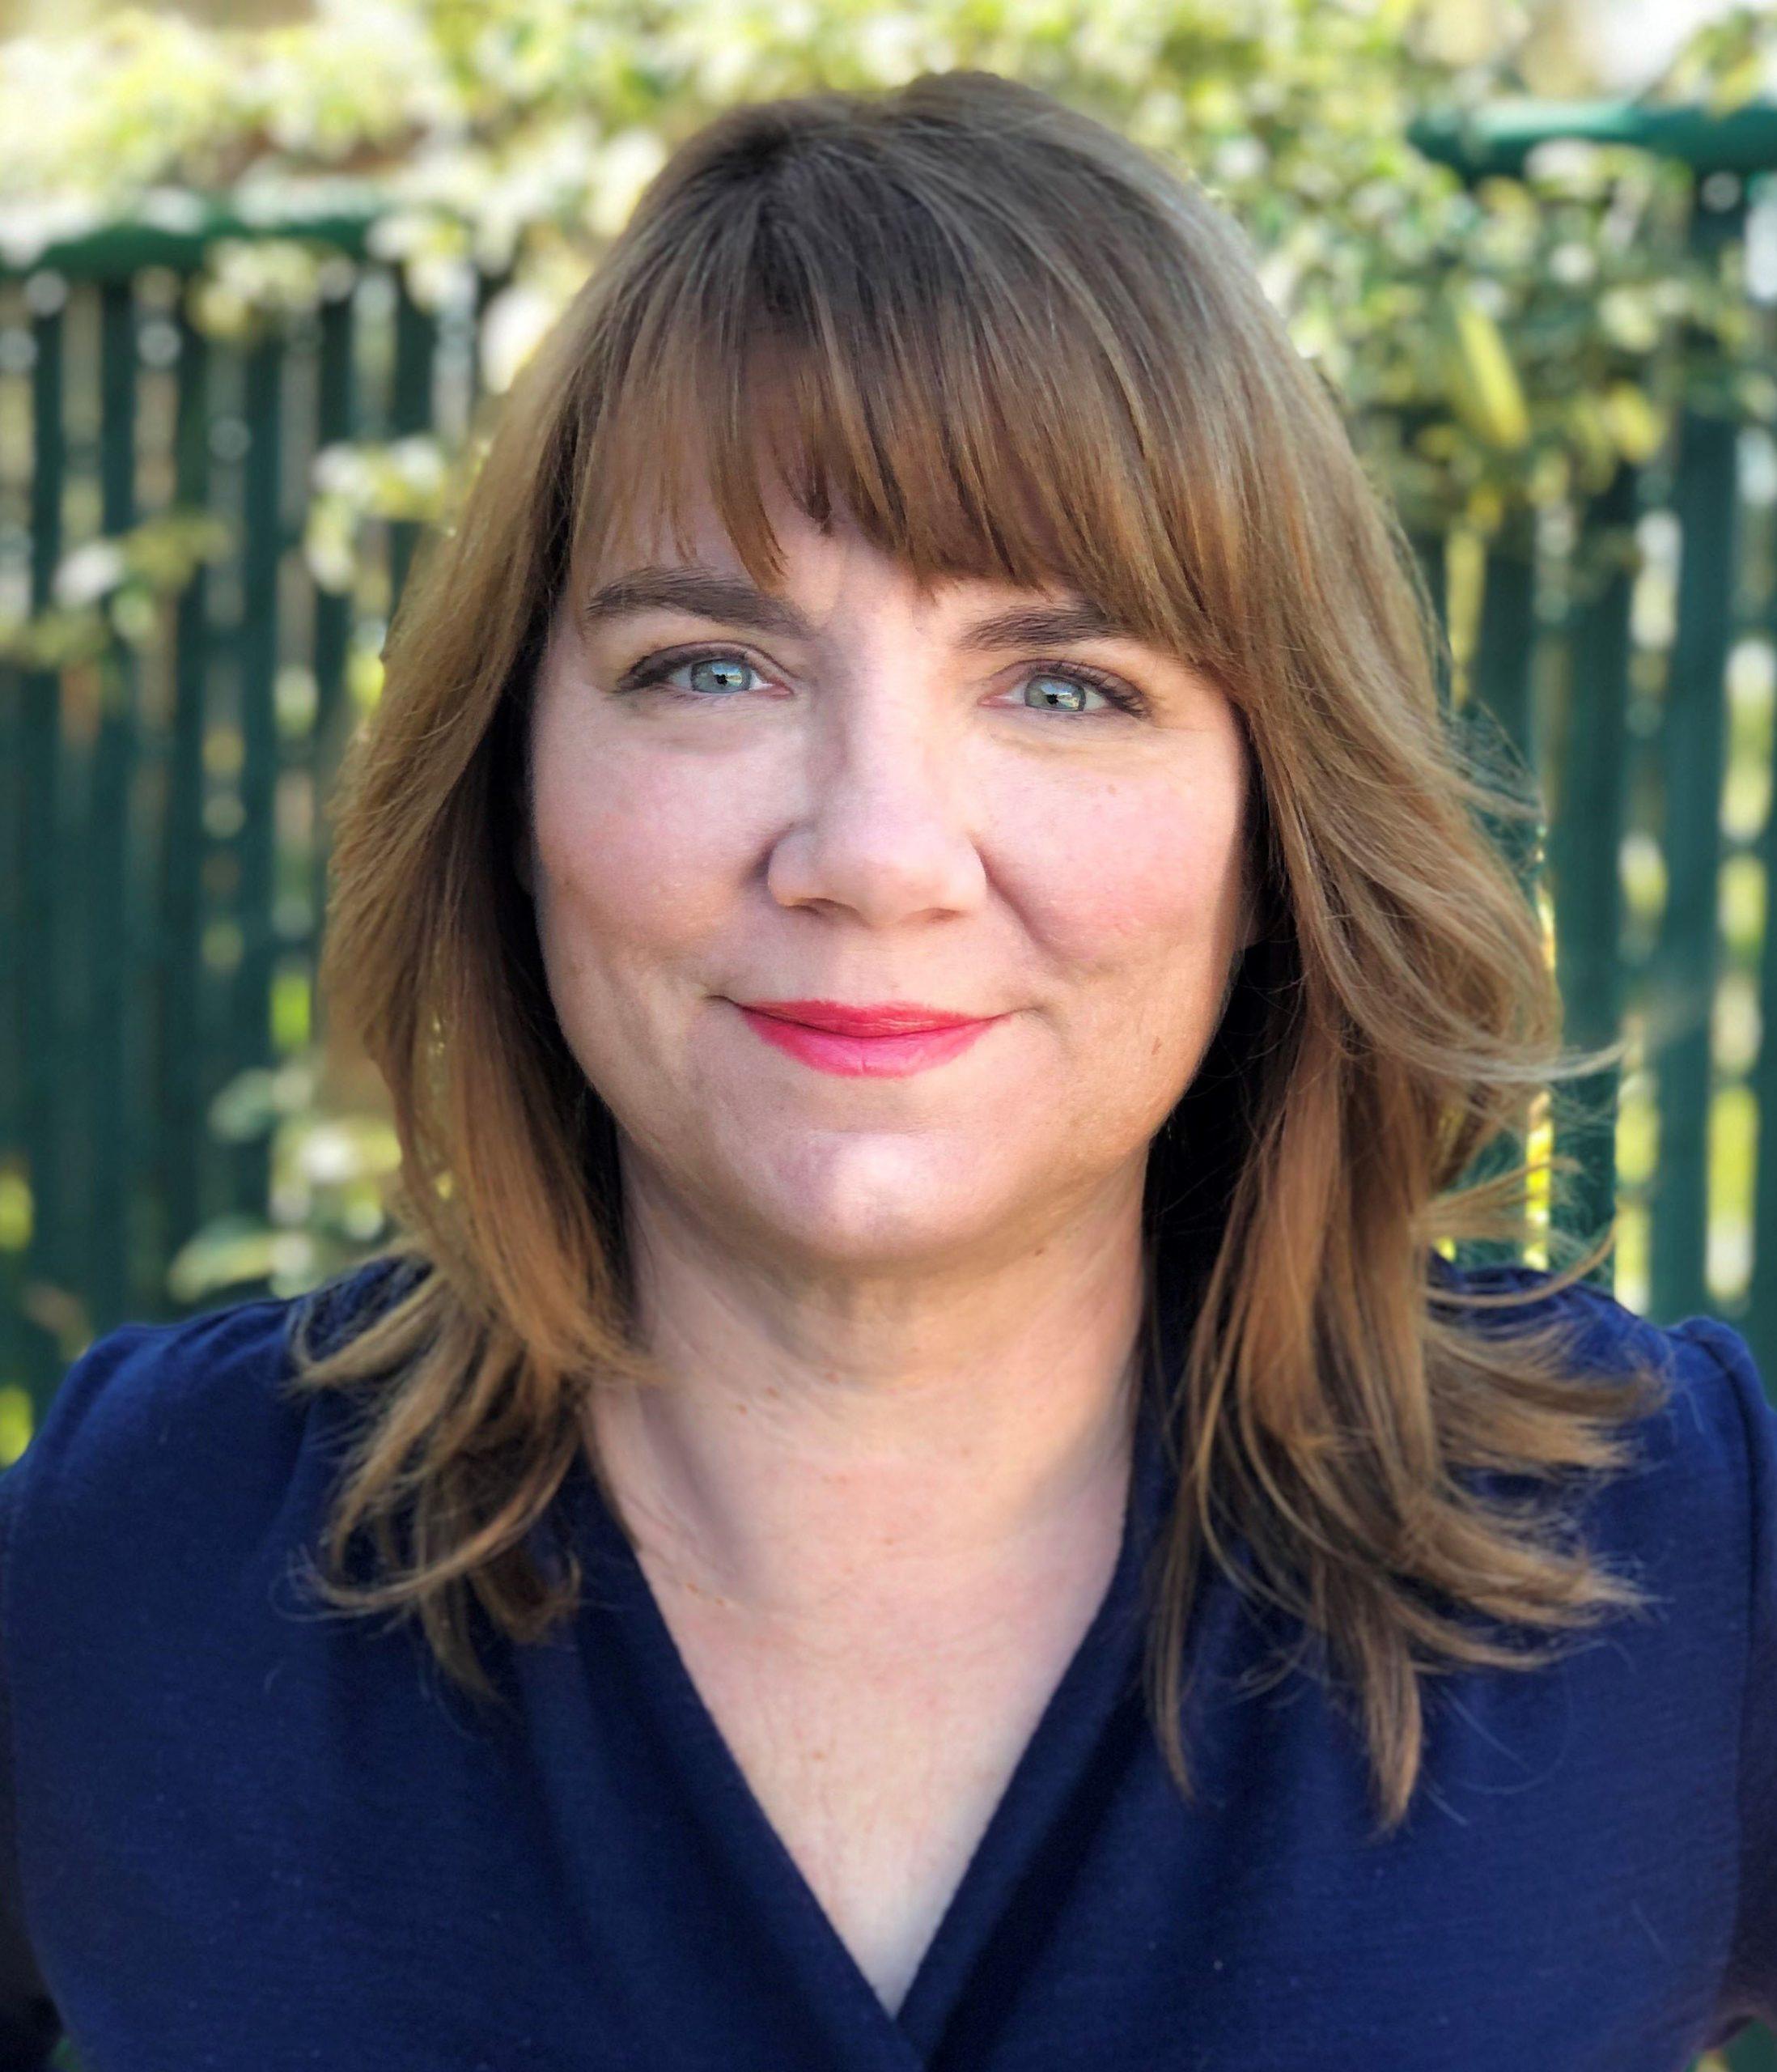 Christine Aday